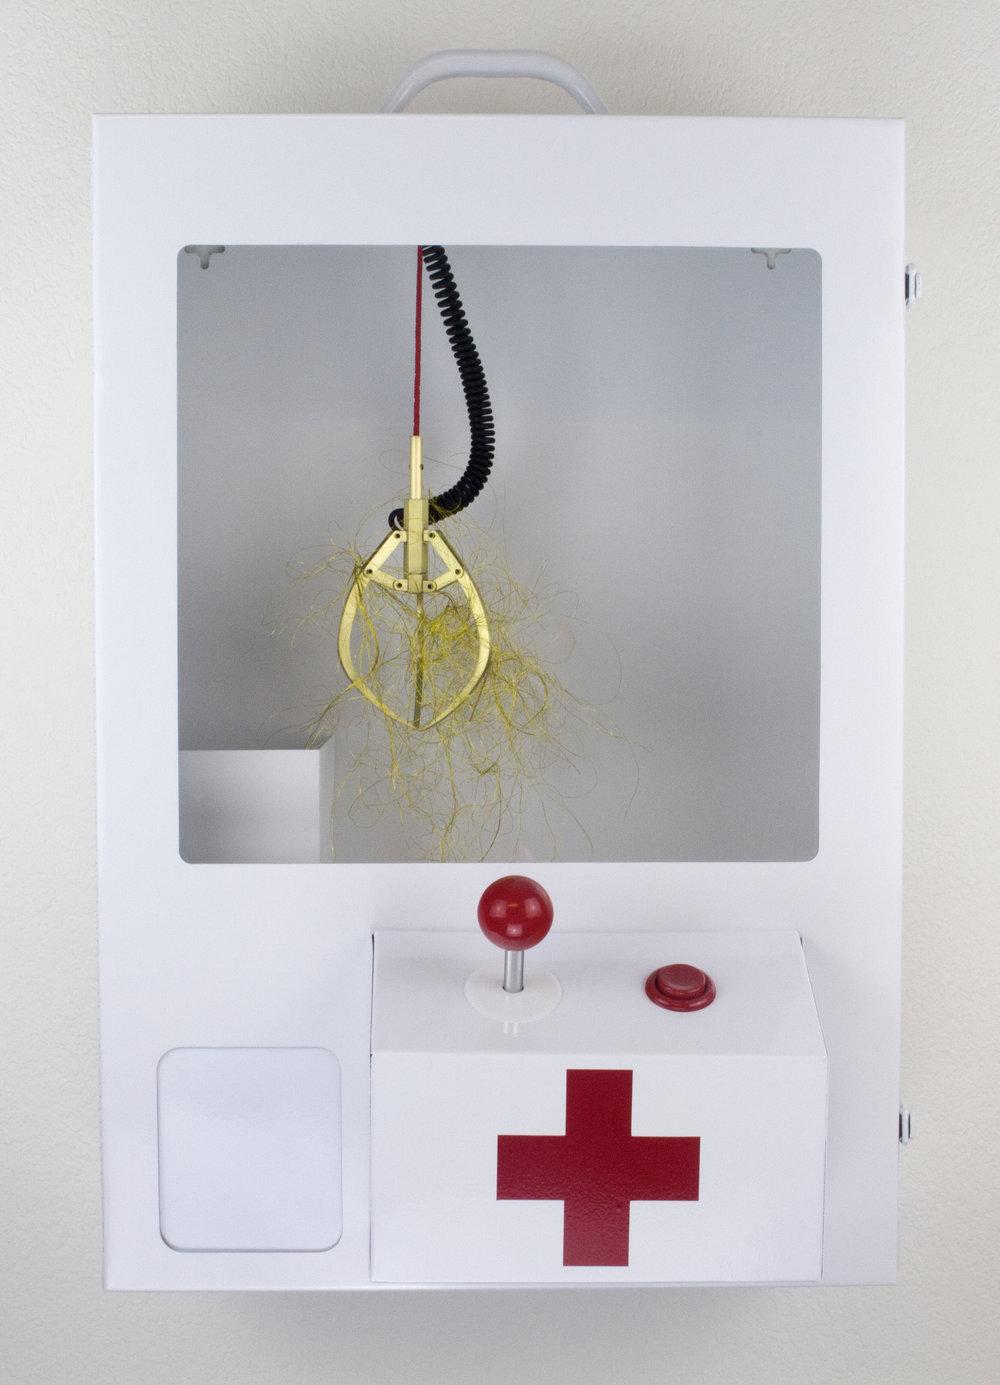 3. First Aid: War